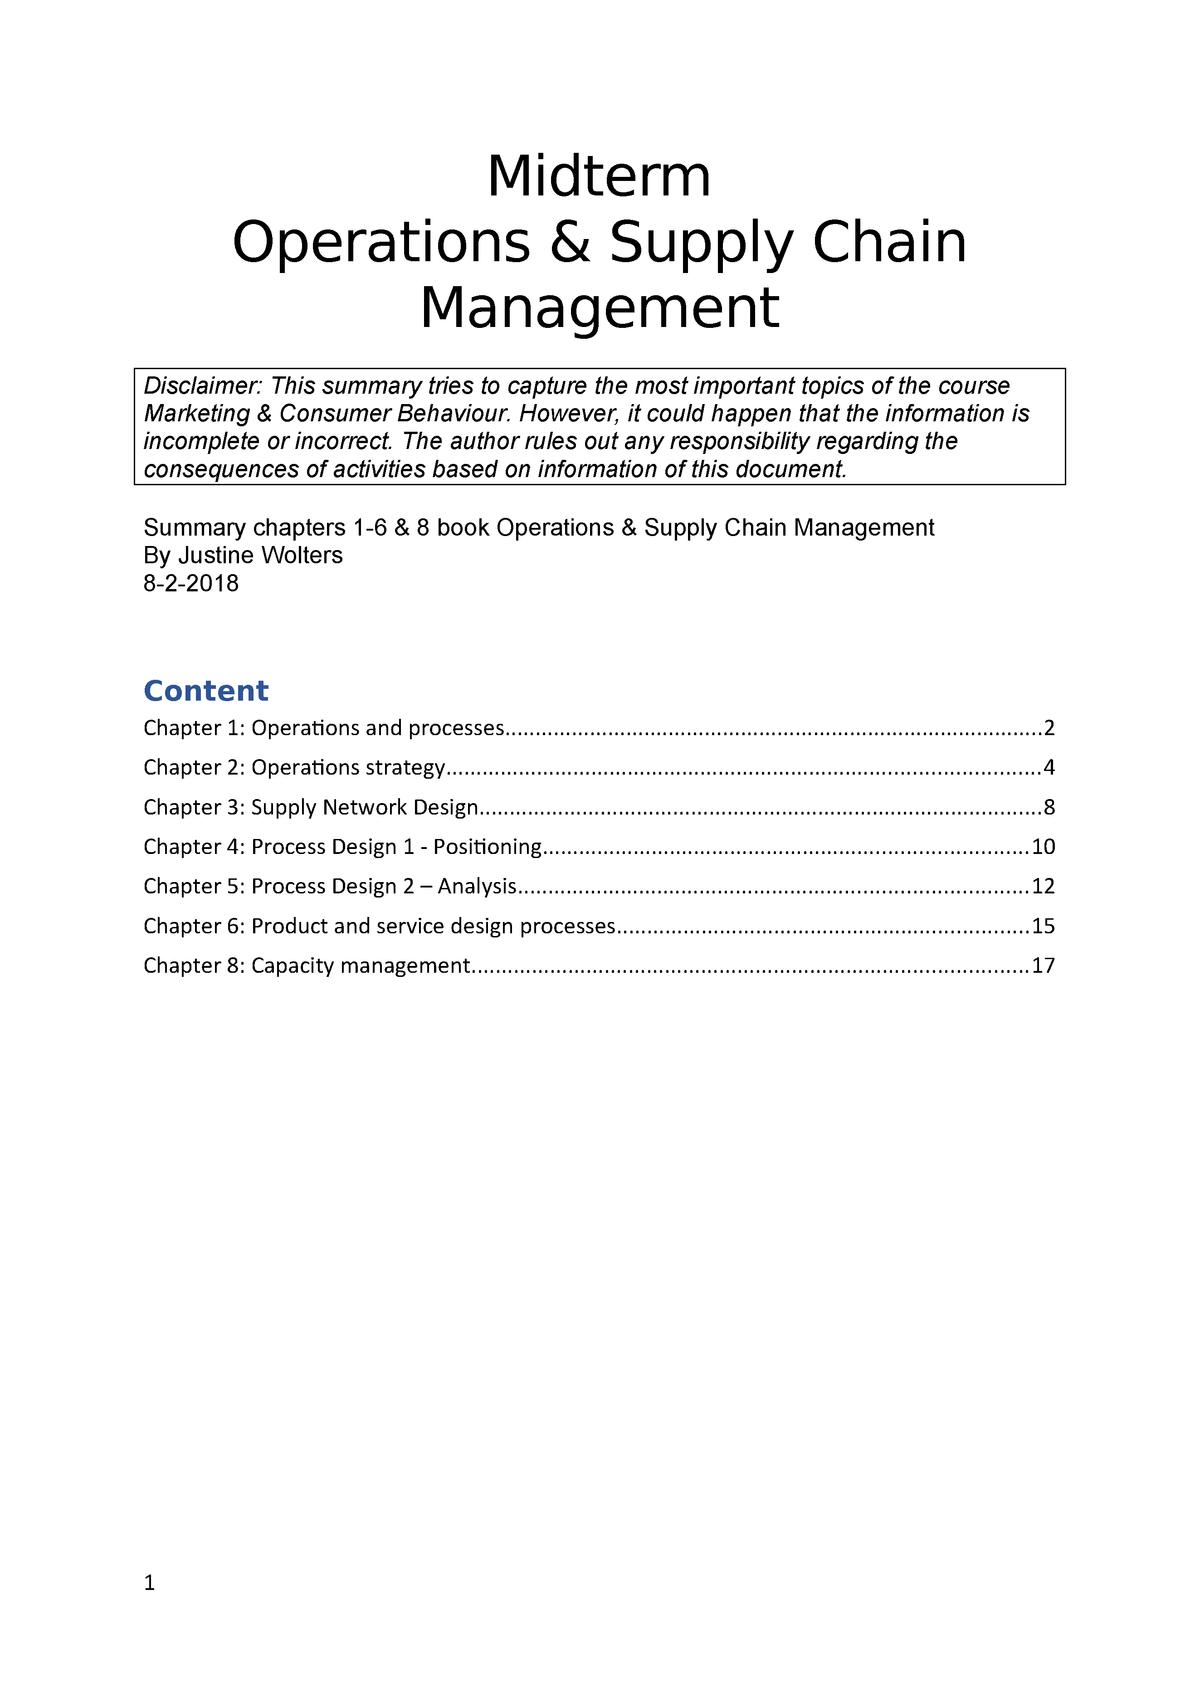 Summary OSCM - Operations & Supply Chain Management